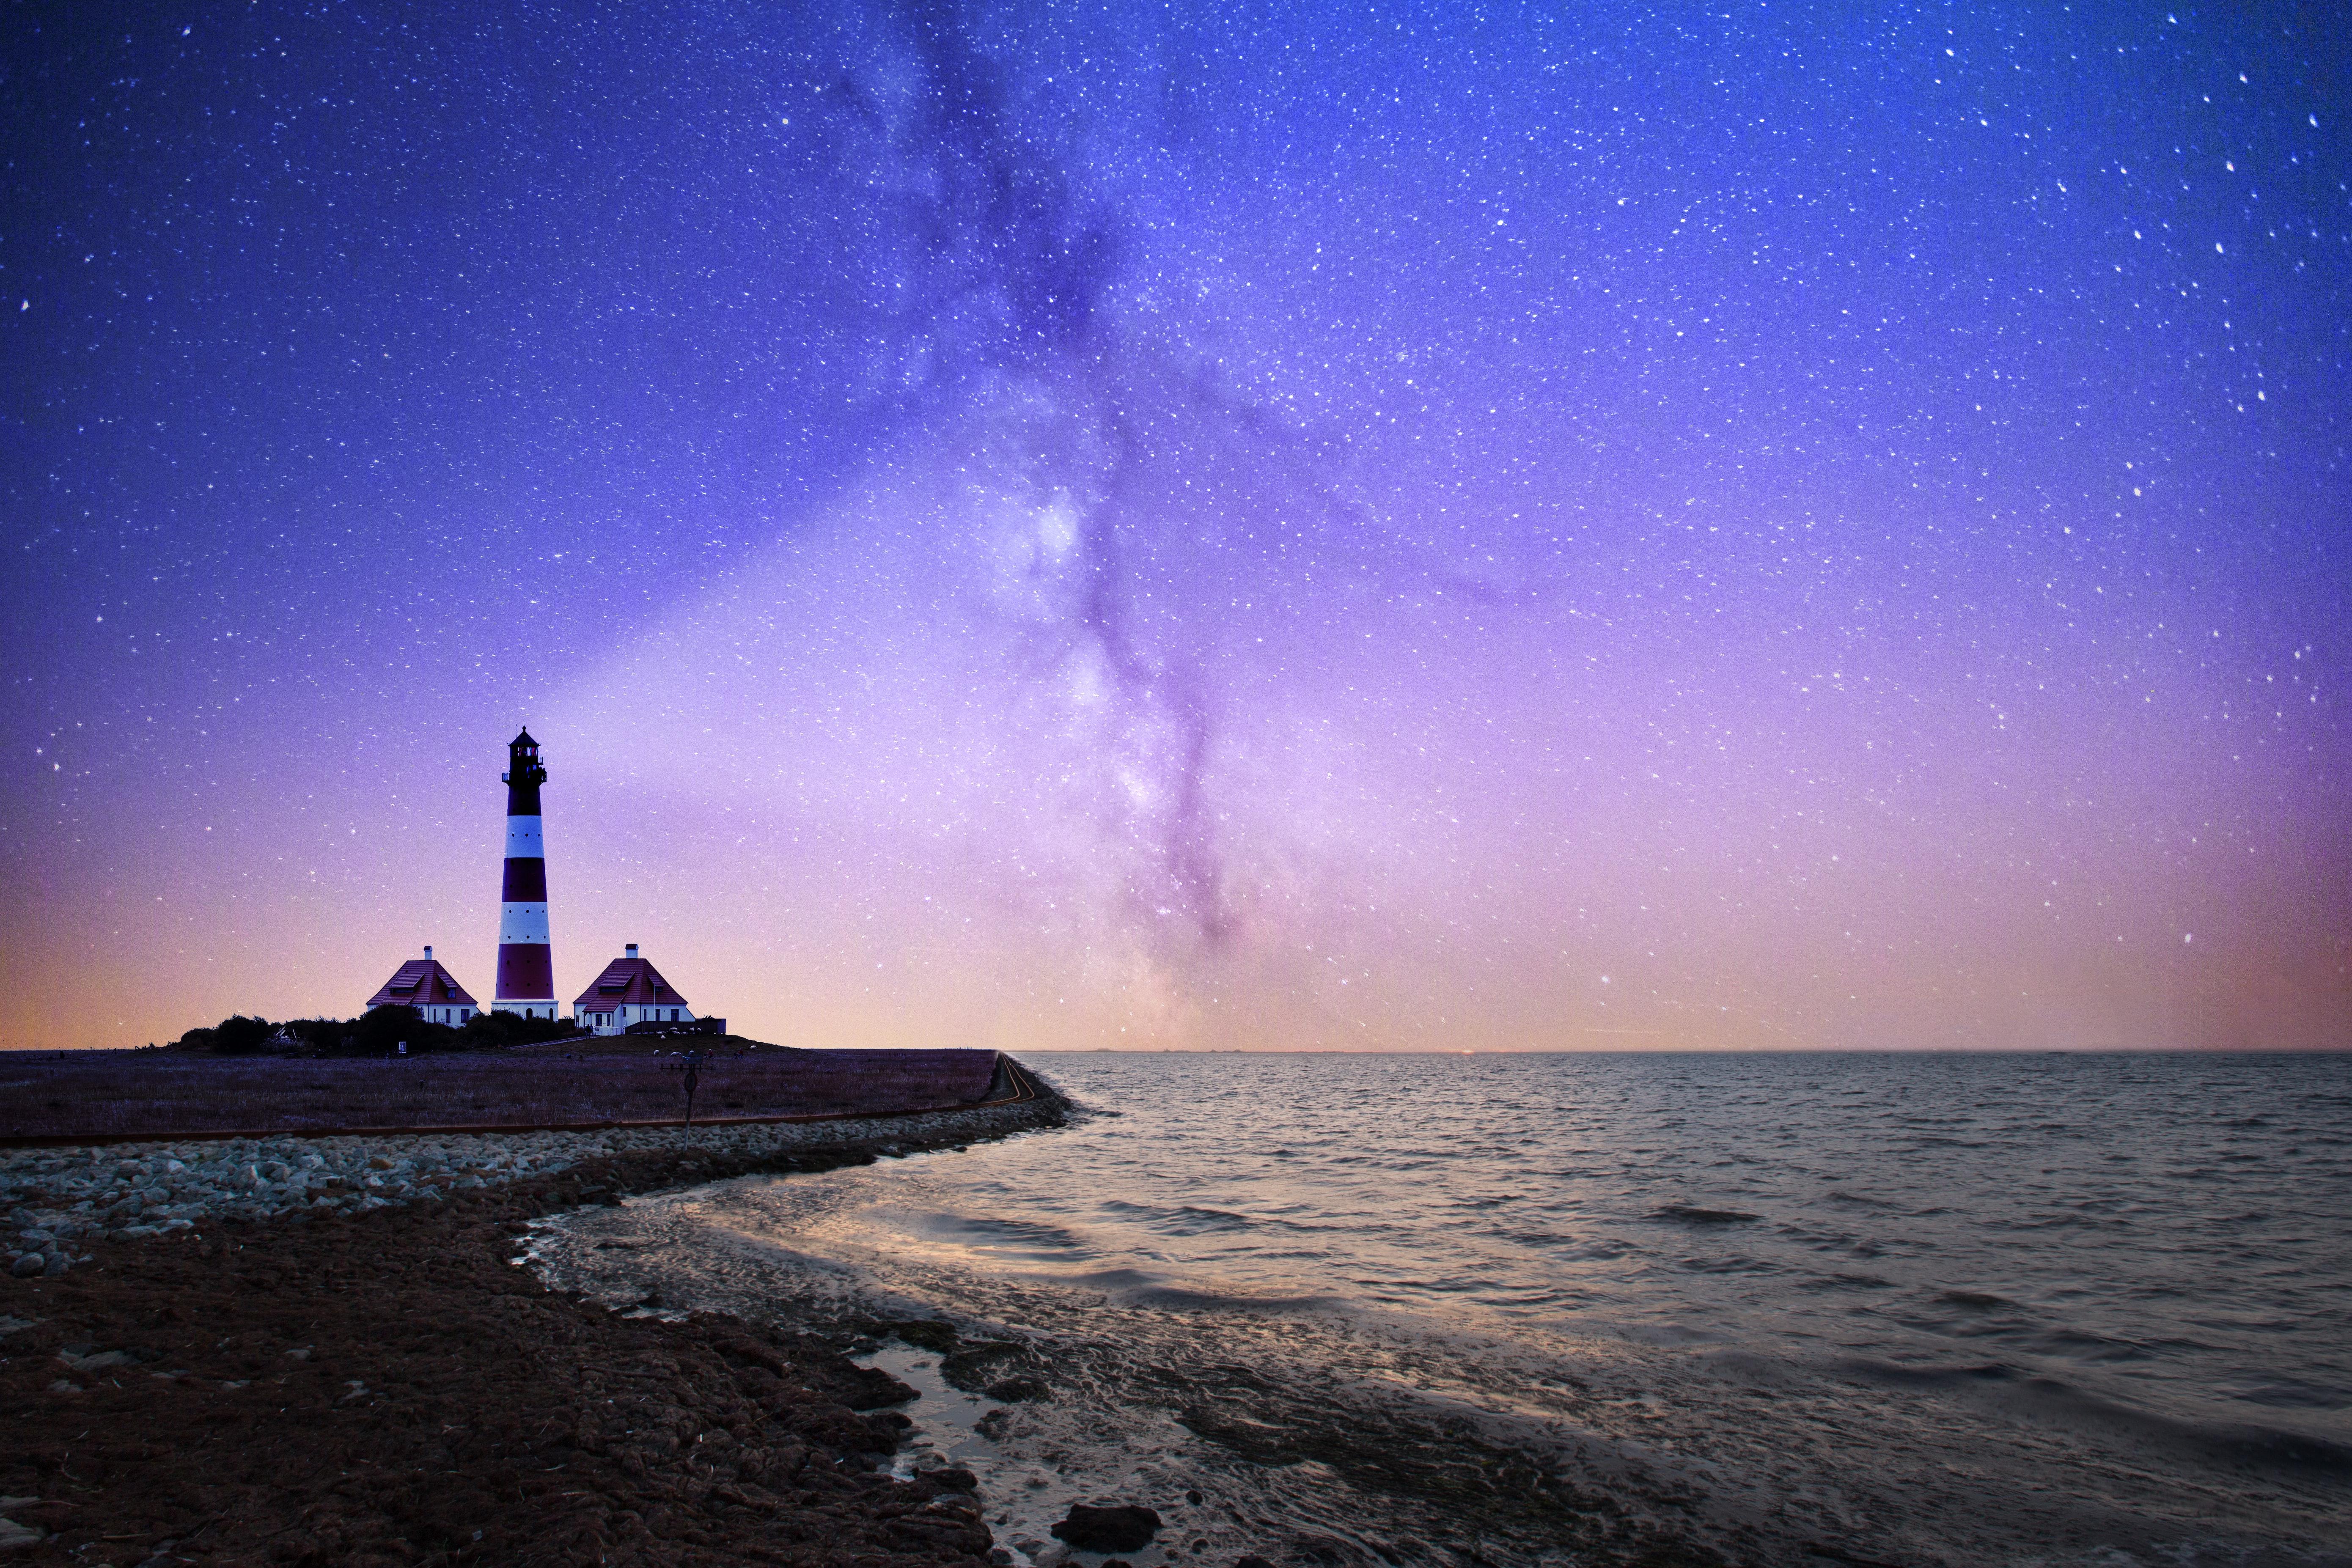 Coastal scene with a lighthouse